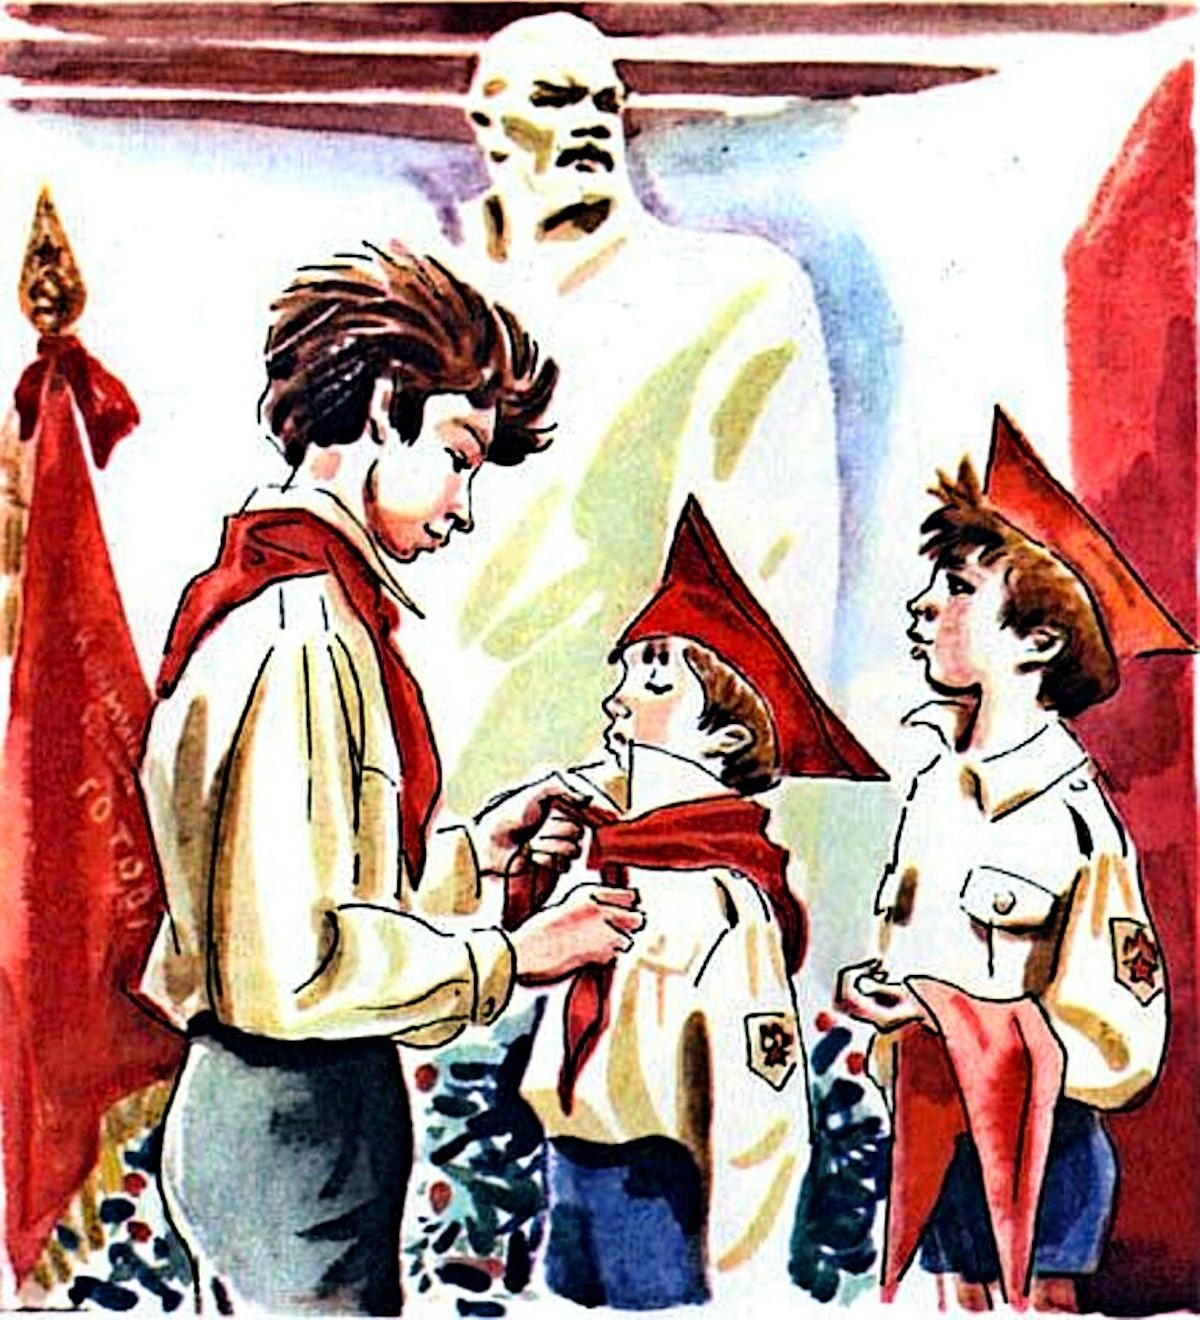 00 soviet pioneers 01. 25.05.14